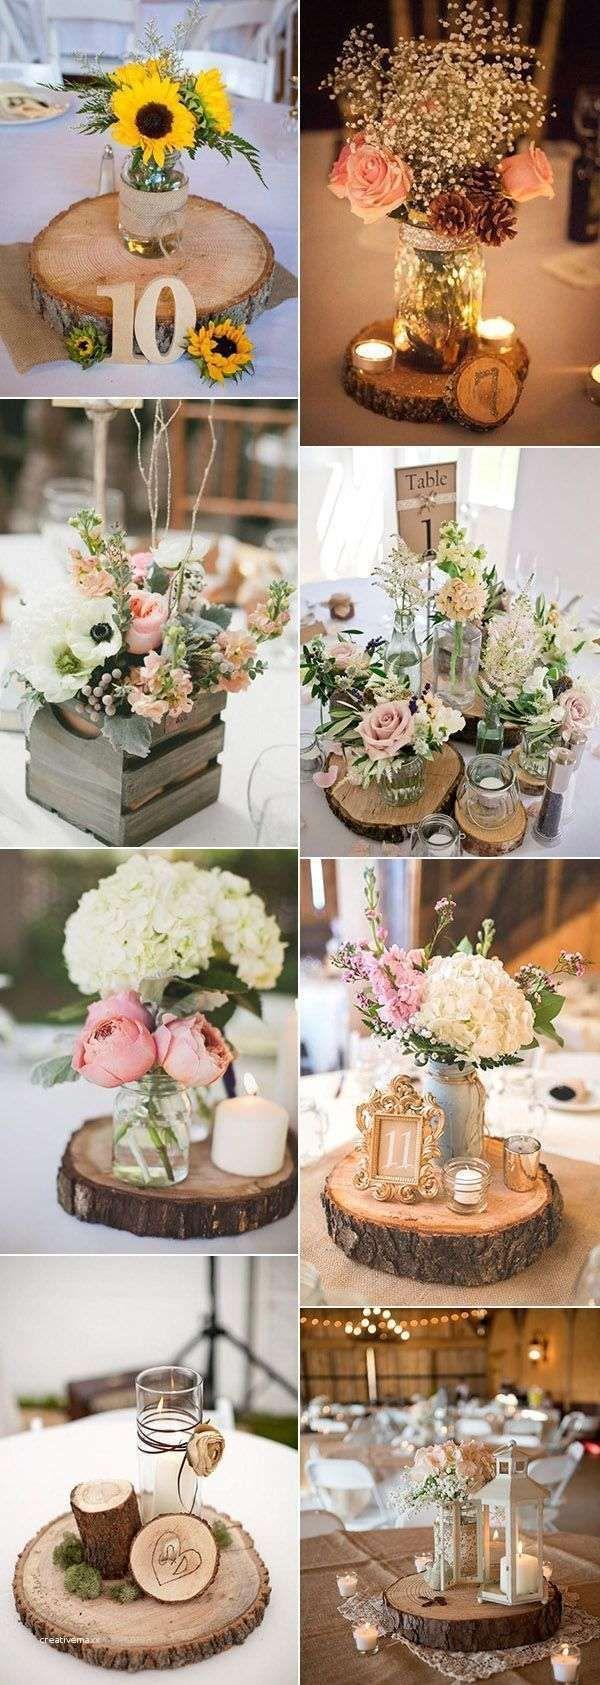 Best 25 wedding table centerpieces ideas on pinterest rustic beautiful rustic fall wedding centerpiece ideas junglespirit Choice Image